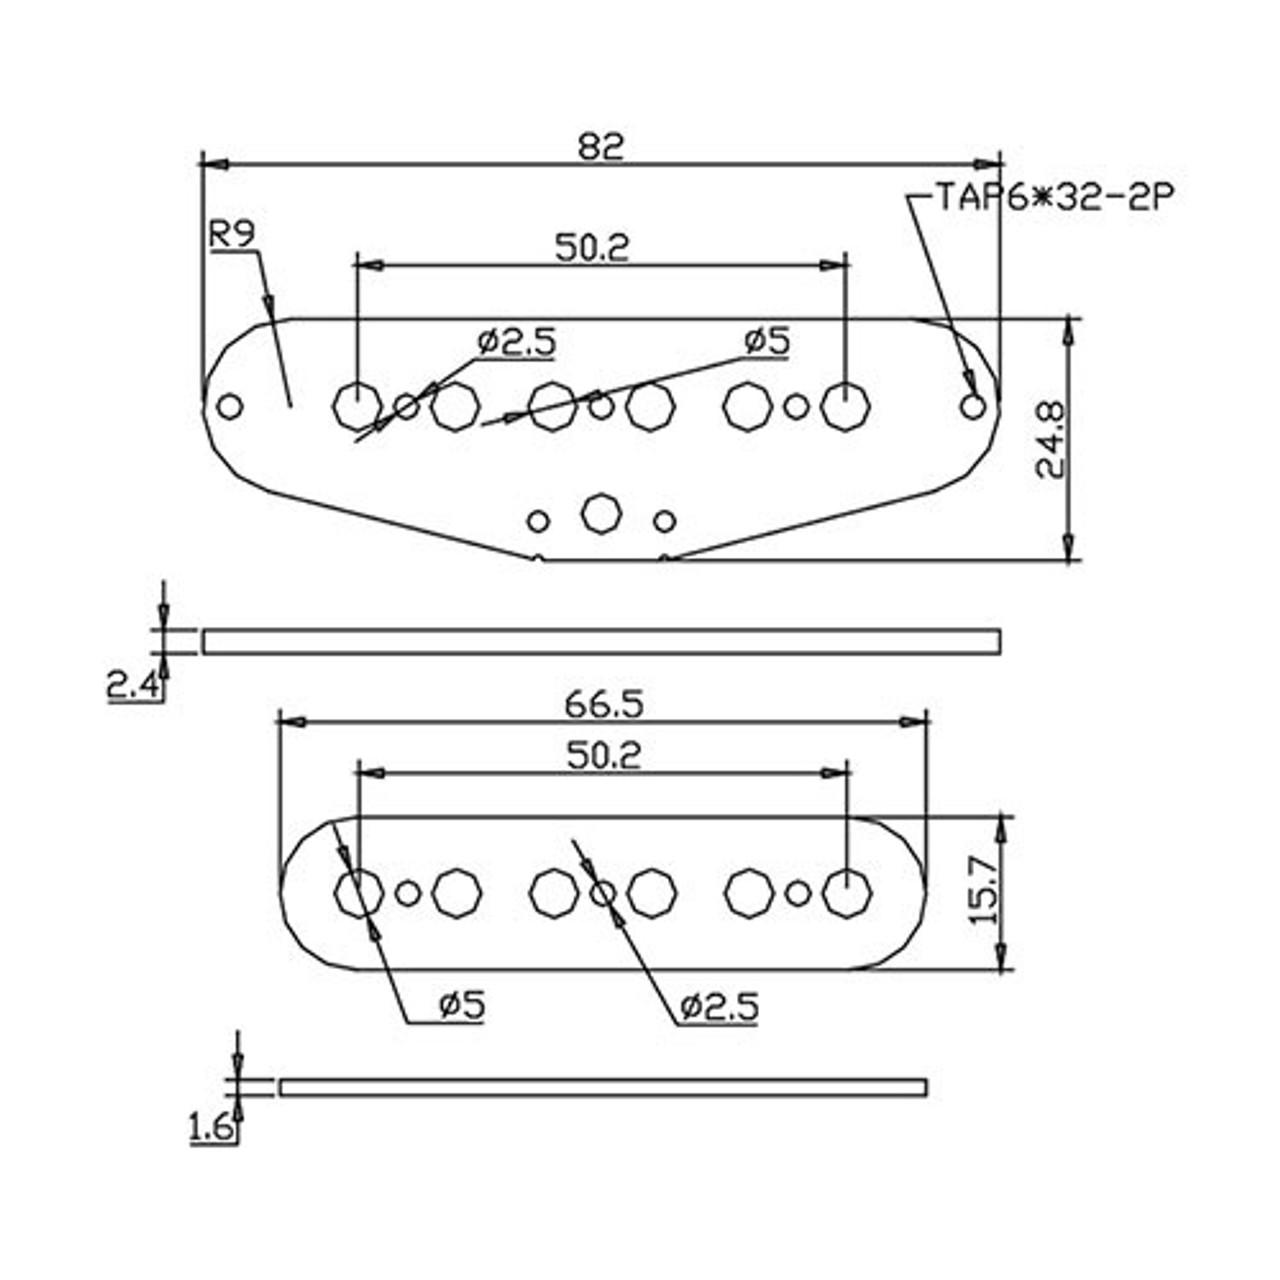 Flatwork Set - Strat 50mm (top and bottom)